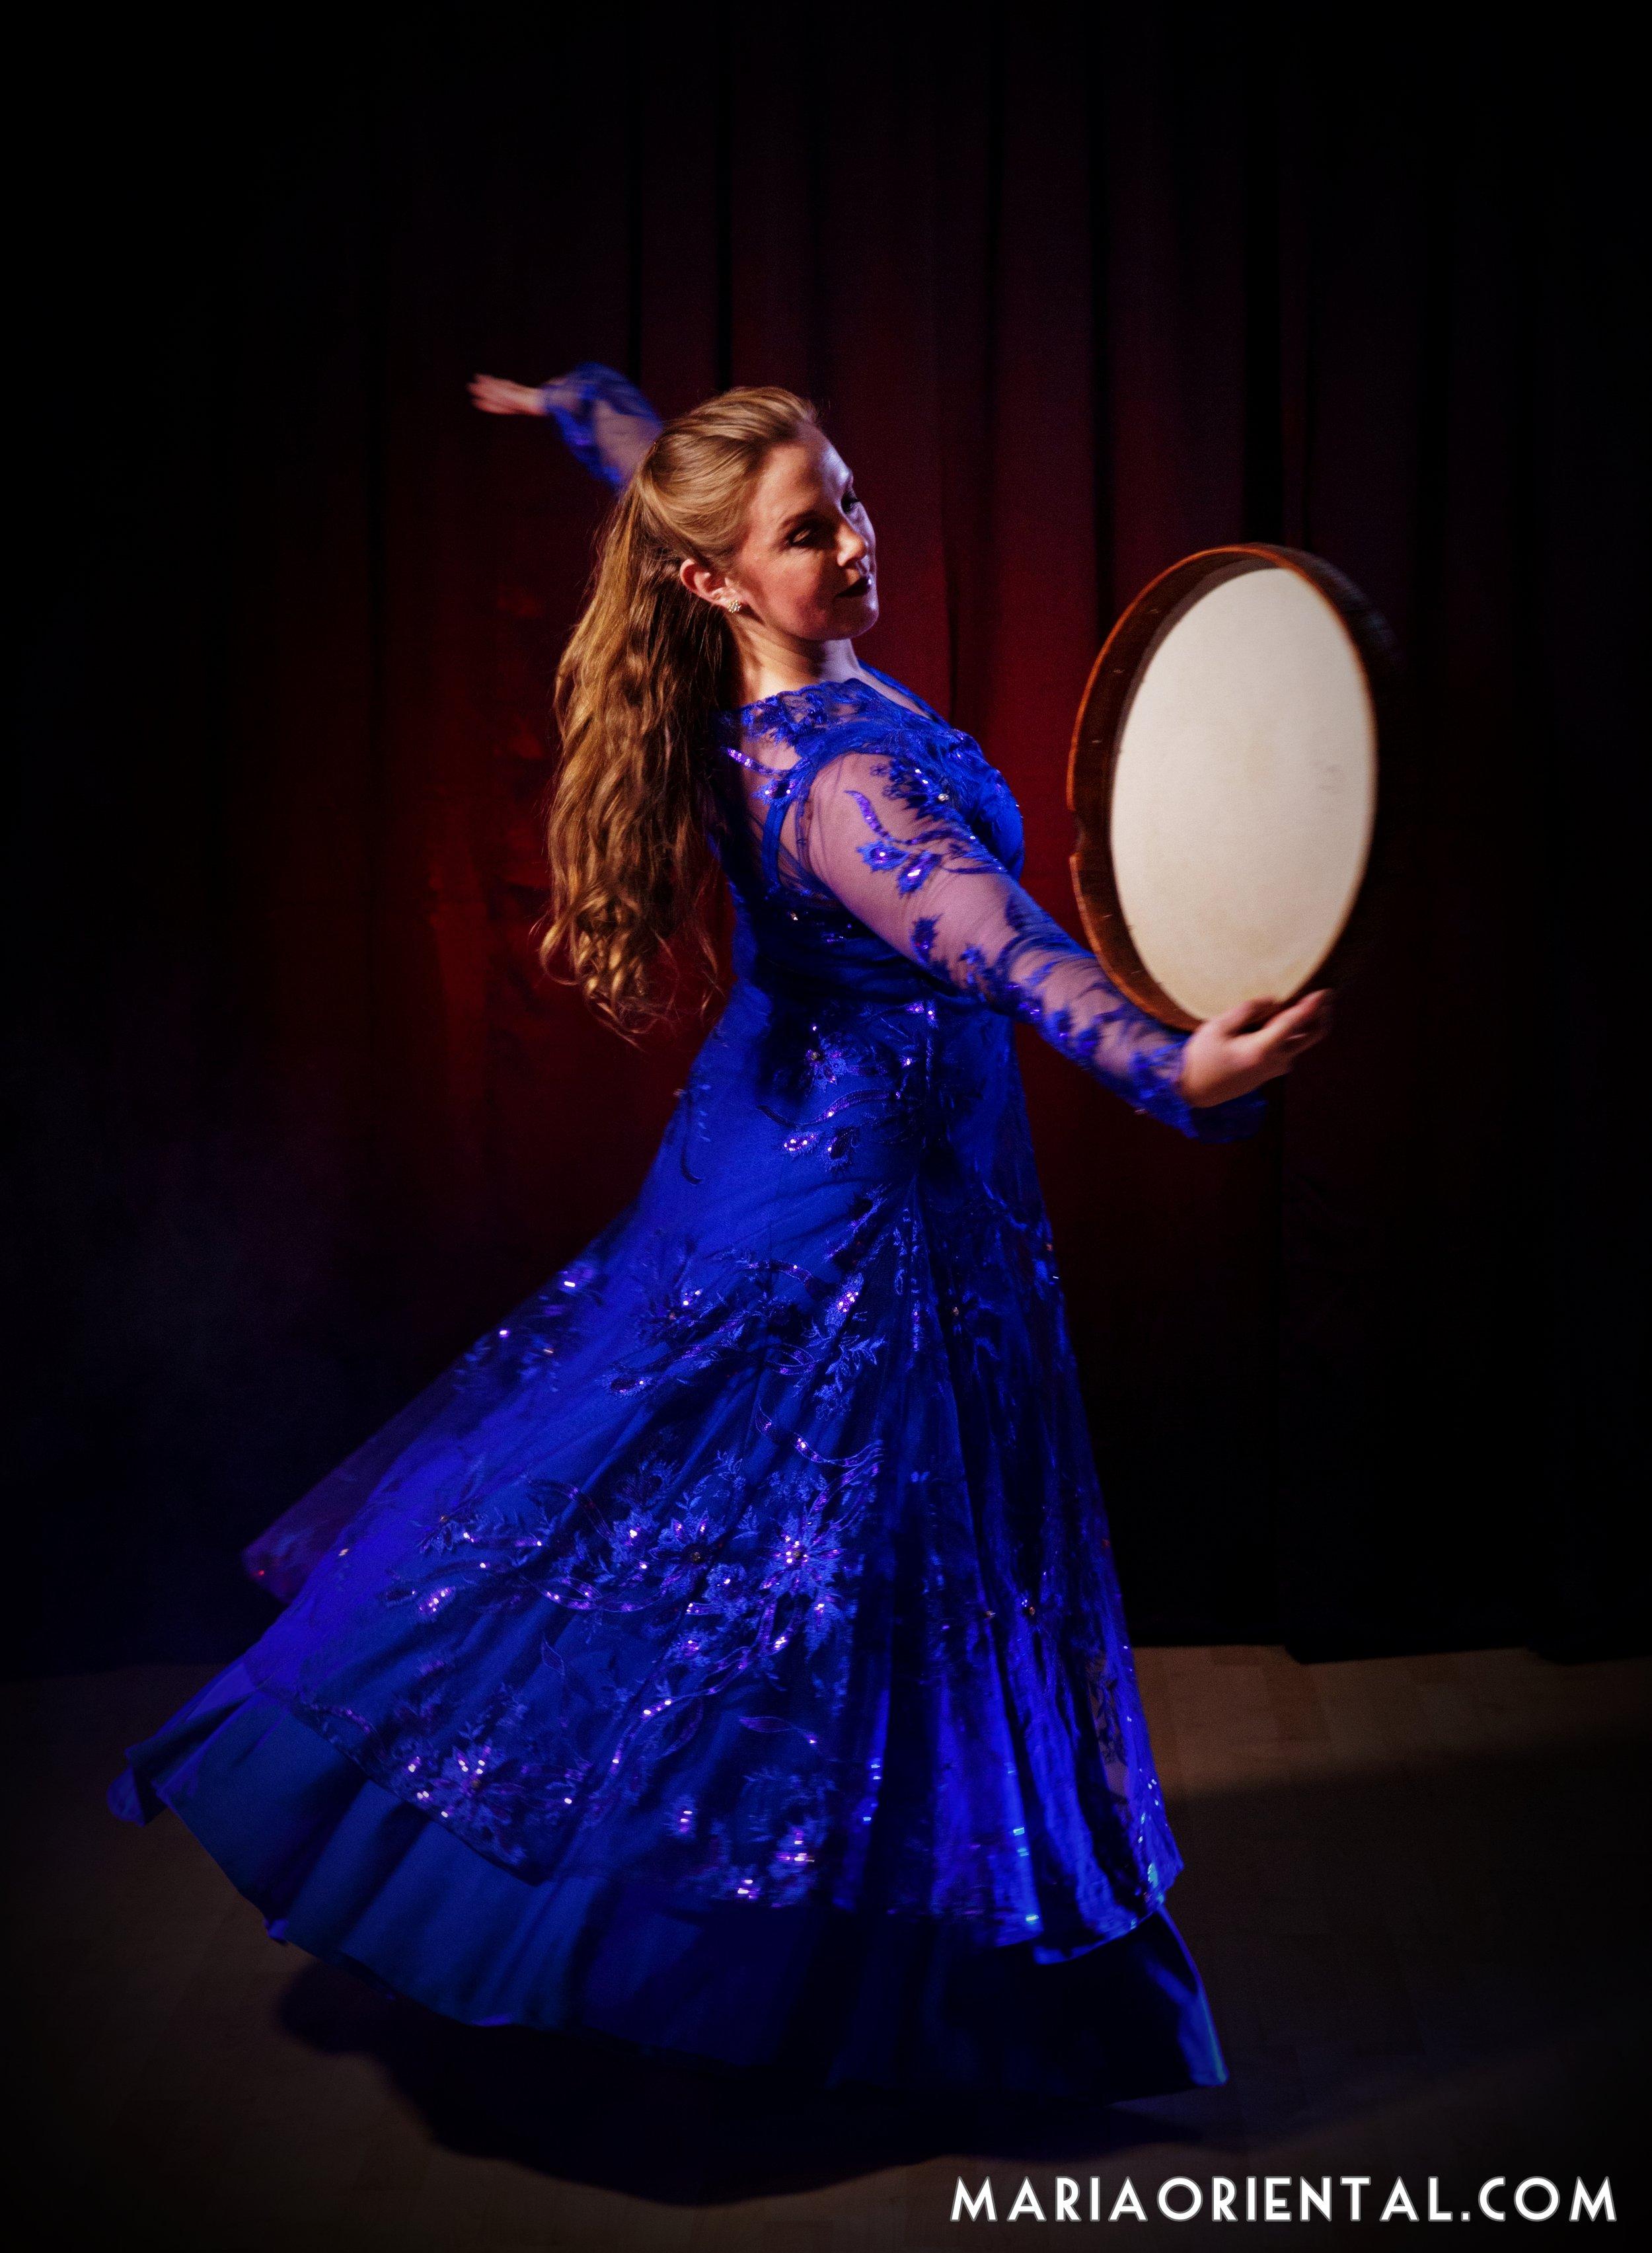 Maria Oriental - Persisk dans.